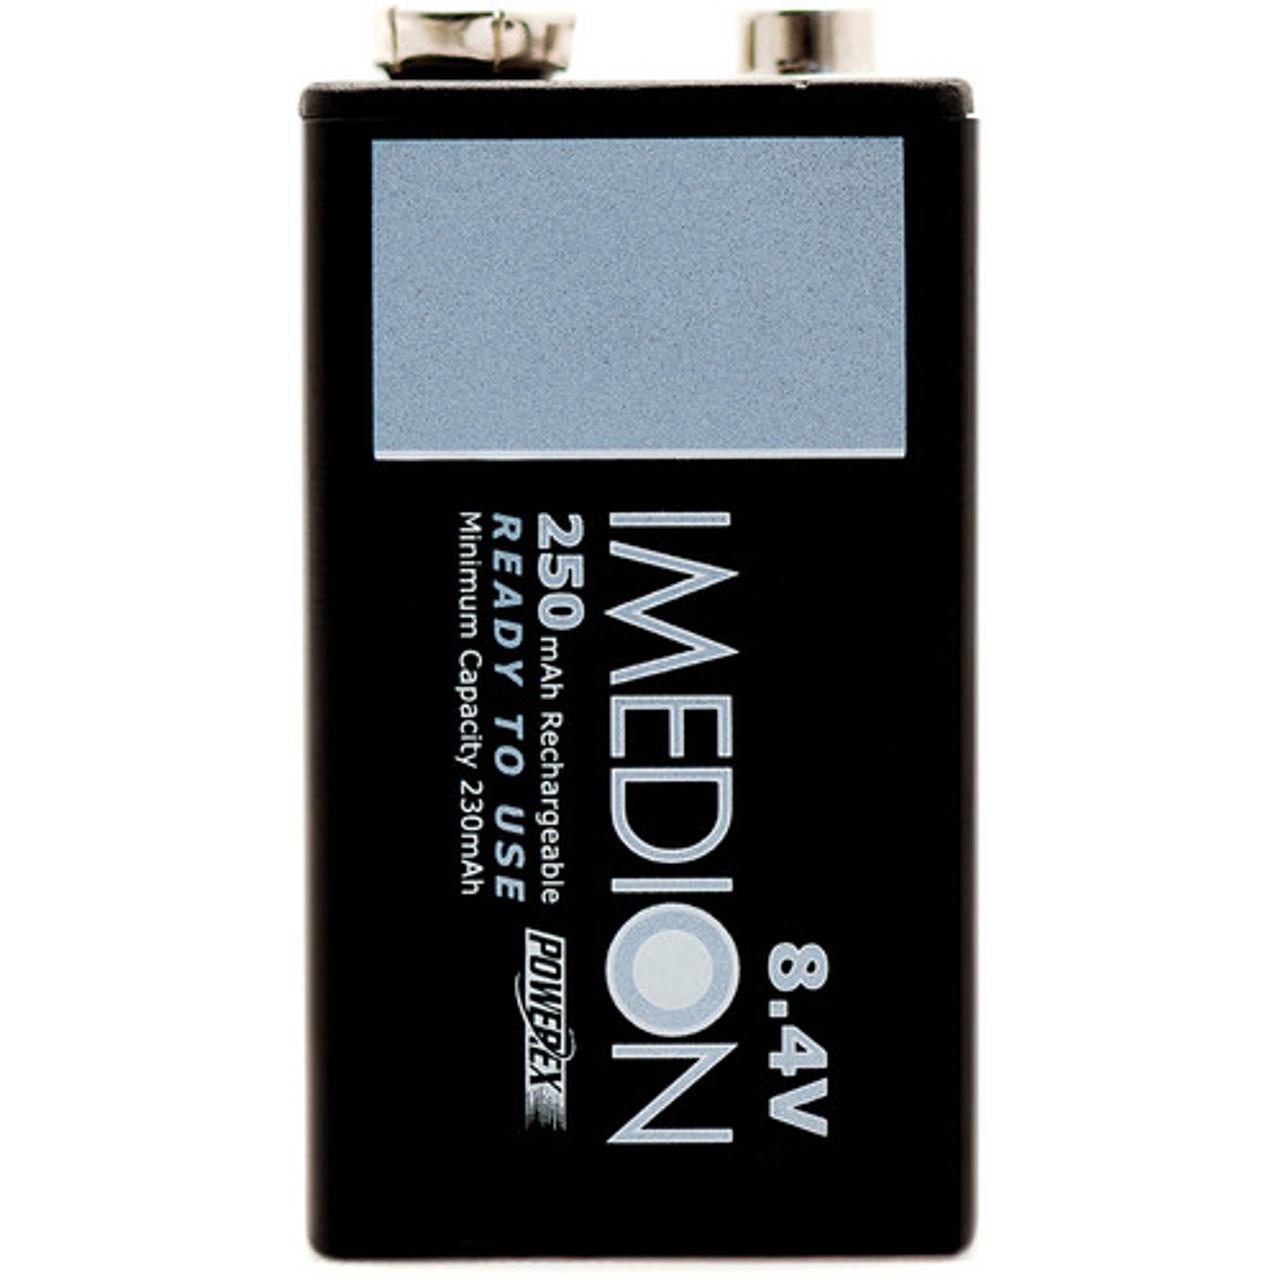 Powerex MHRAAAI4 Imedion AAA 950mAh 4-Pack Rechargeable Batteries